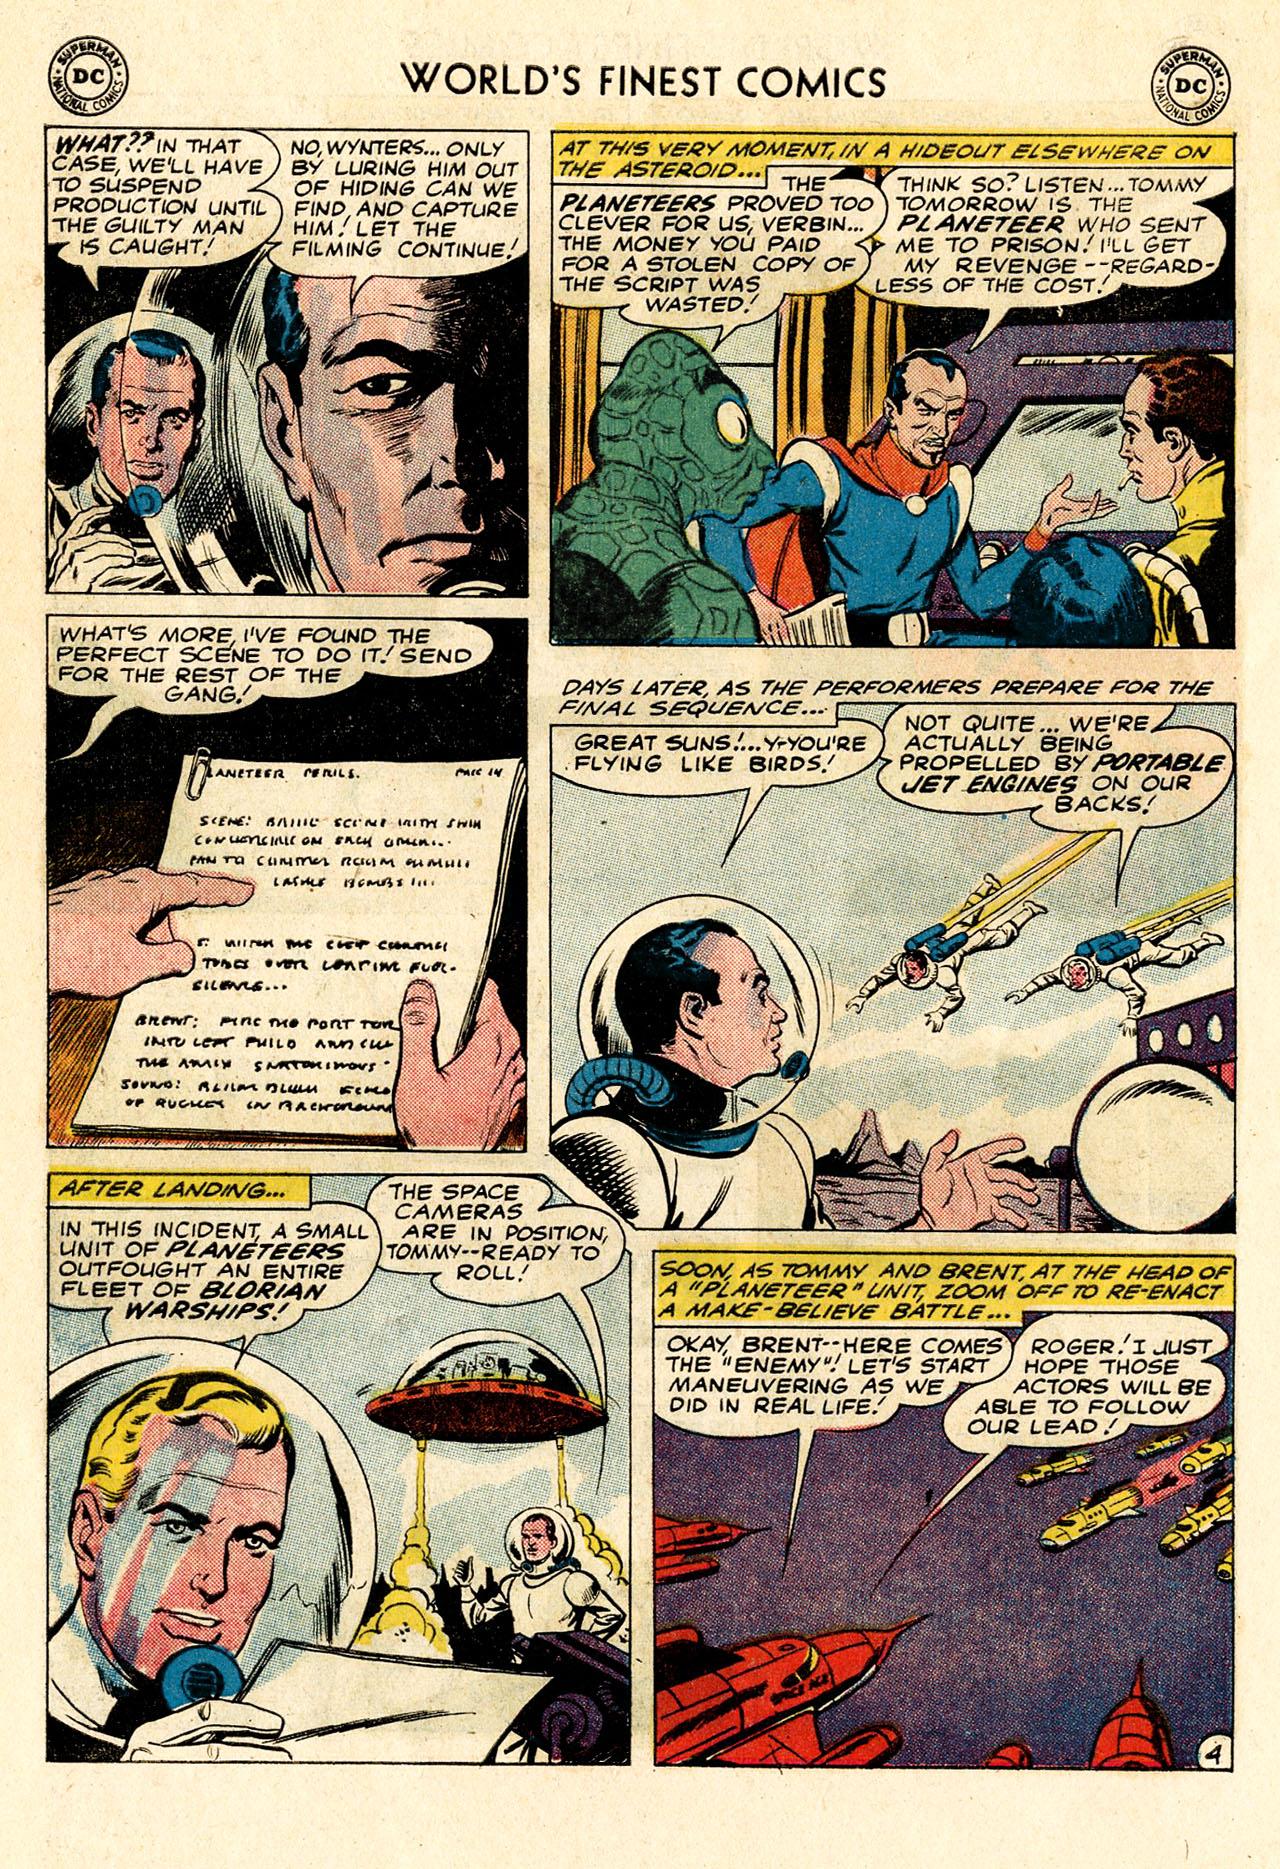 Read online World's Finest Comics comic -  Issue #107 - 22